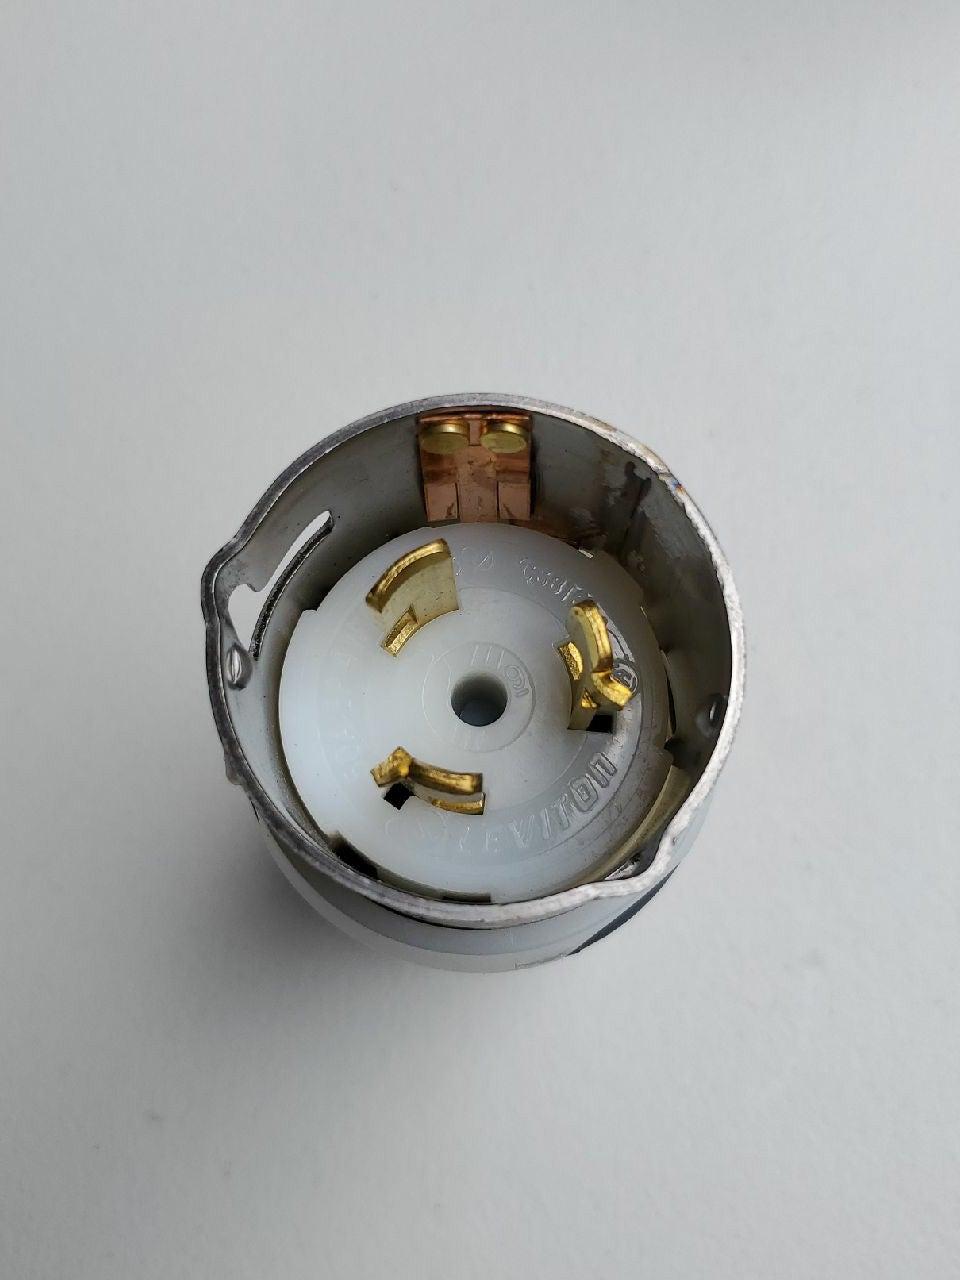 LEVITON CS8165C 50A LOCKING PLUG 3-PHASE